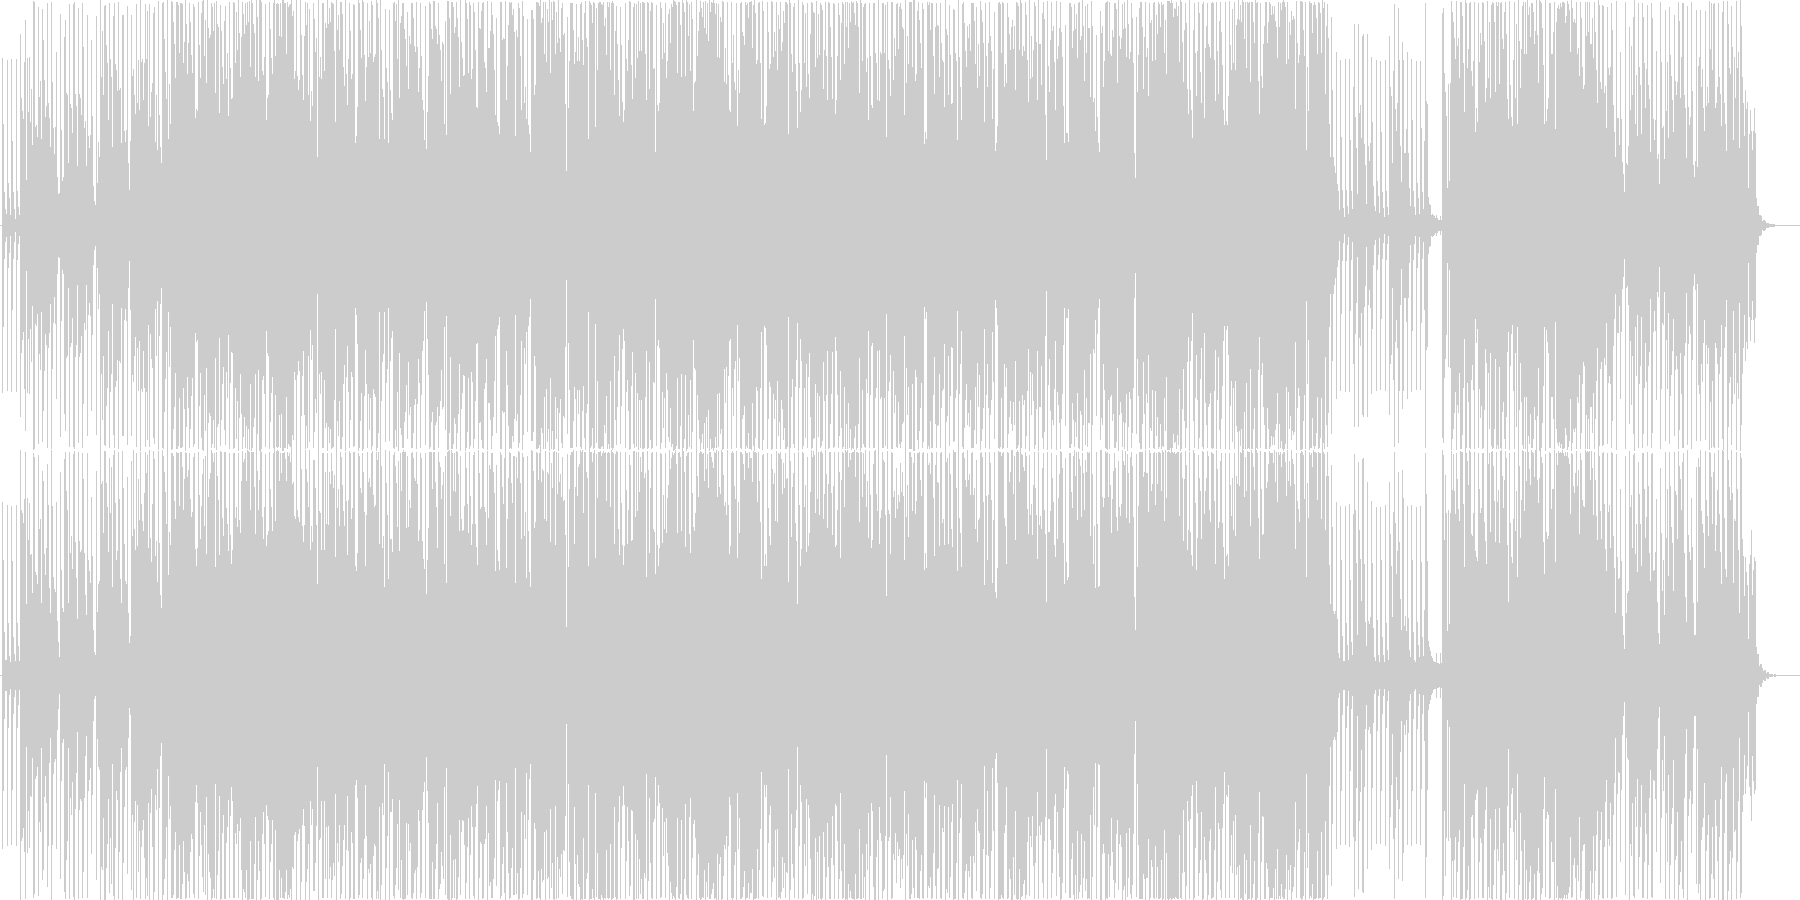 Vaporwaveポップ 夏の恋の終わりの未再生の波形